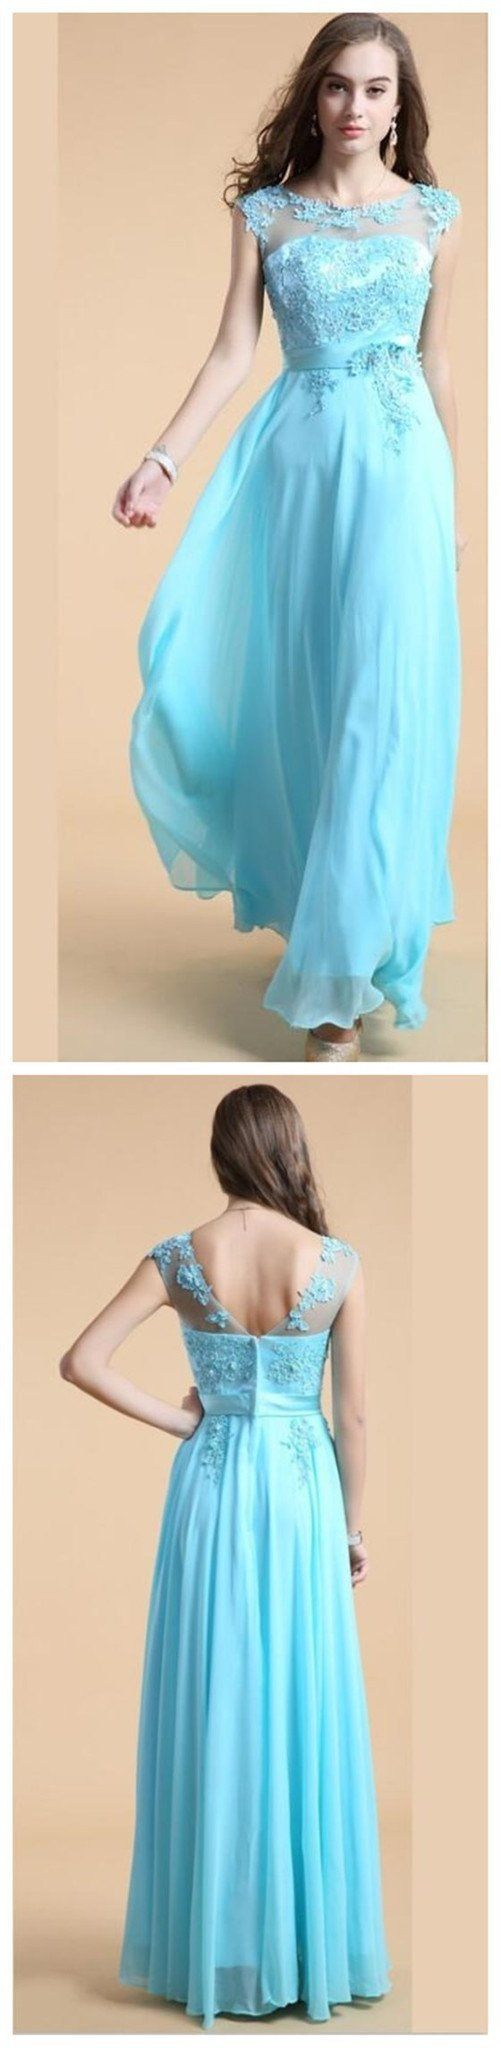 Blue A-line Pretty Cheap Party Evening Long Prom Dresses Online,PD0126